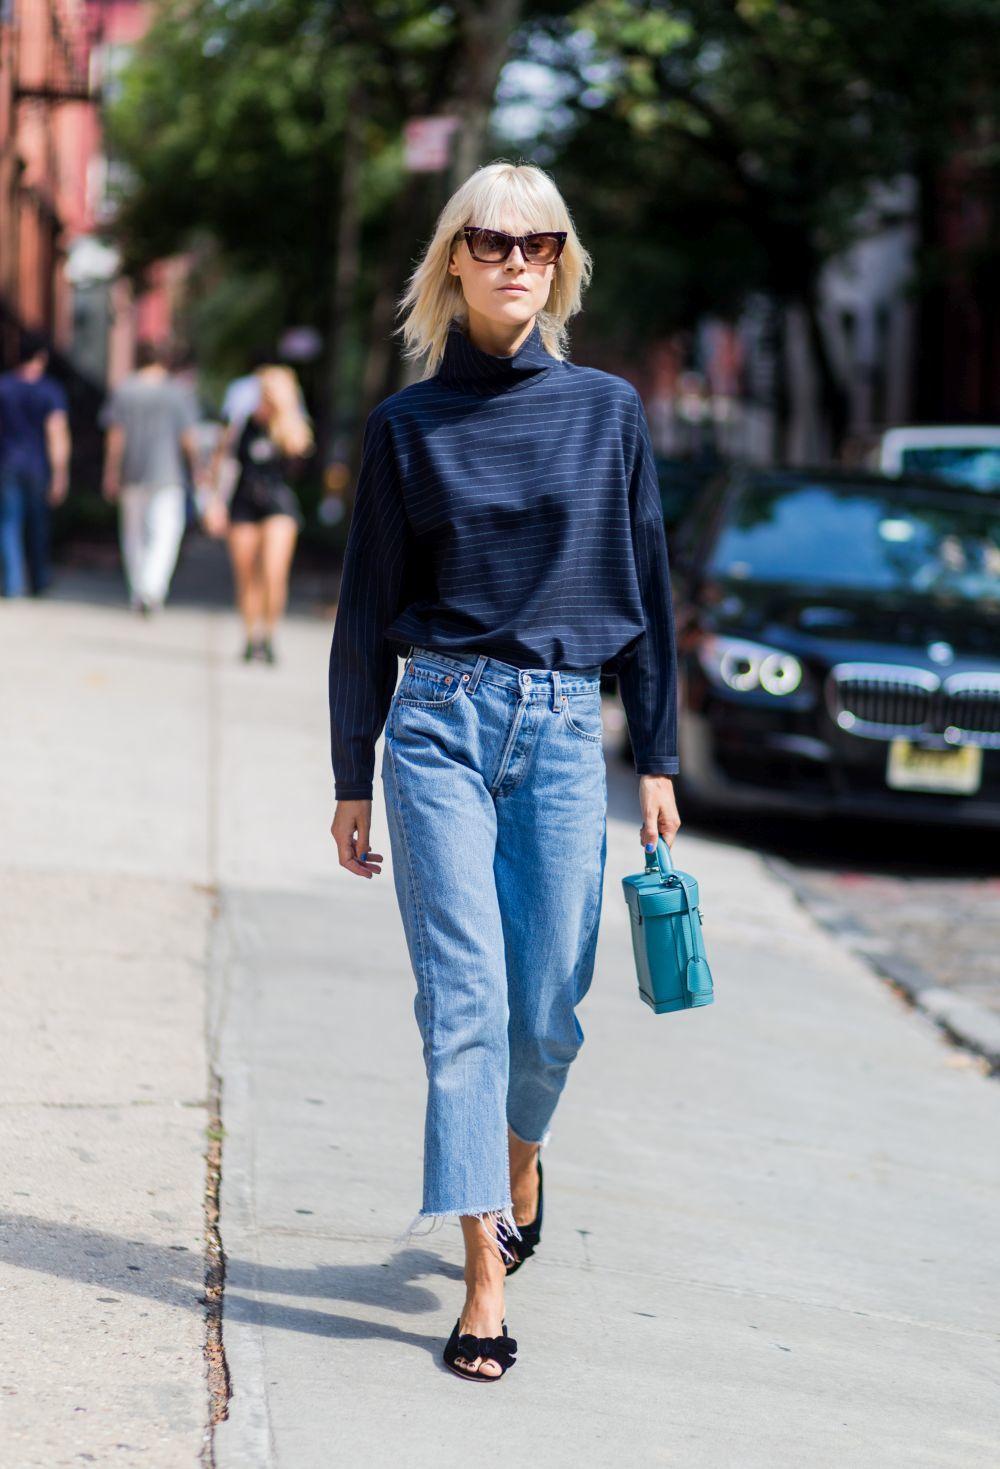 Jeans con blusa y sandalia plana.